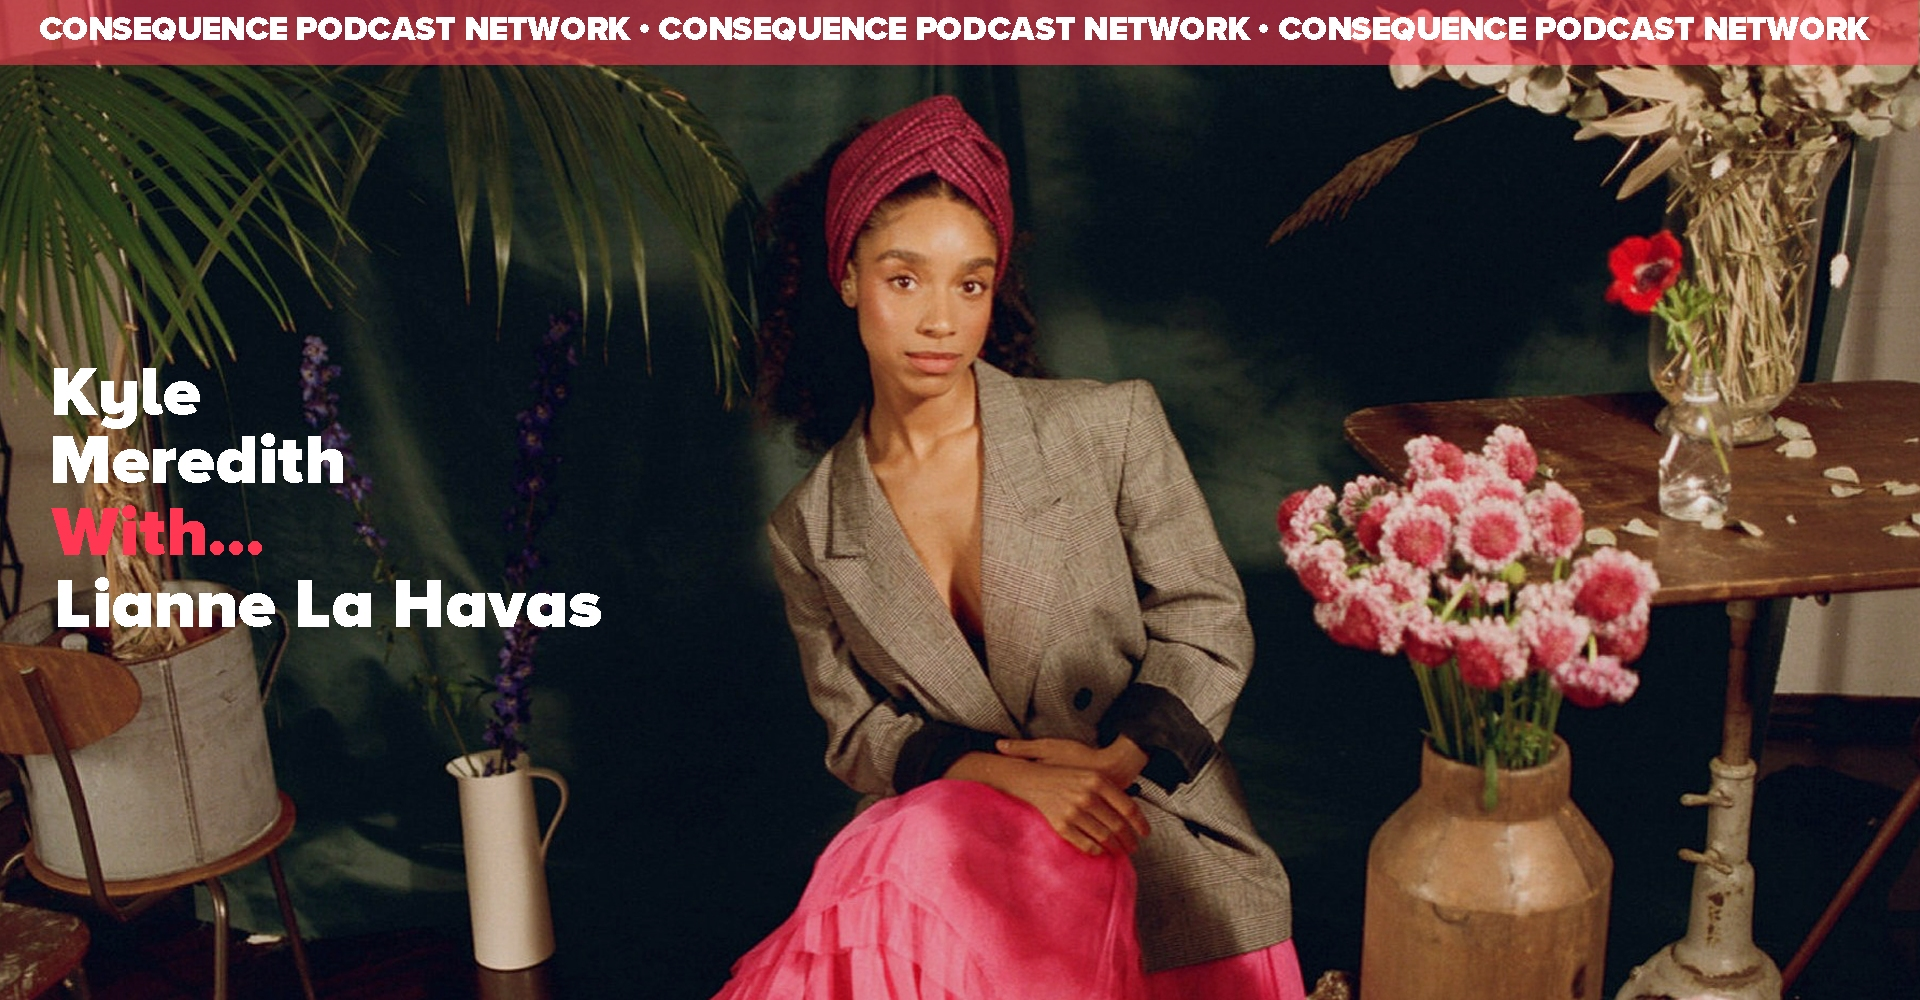 Lianne La Havas on Why She Covered Radiohead